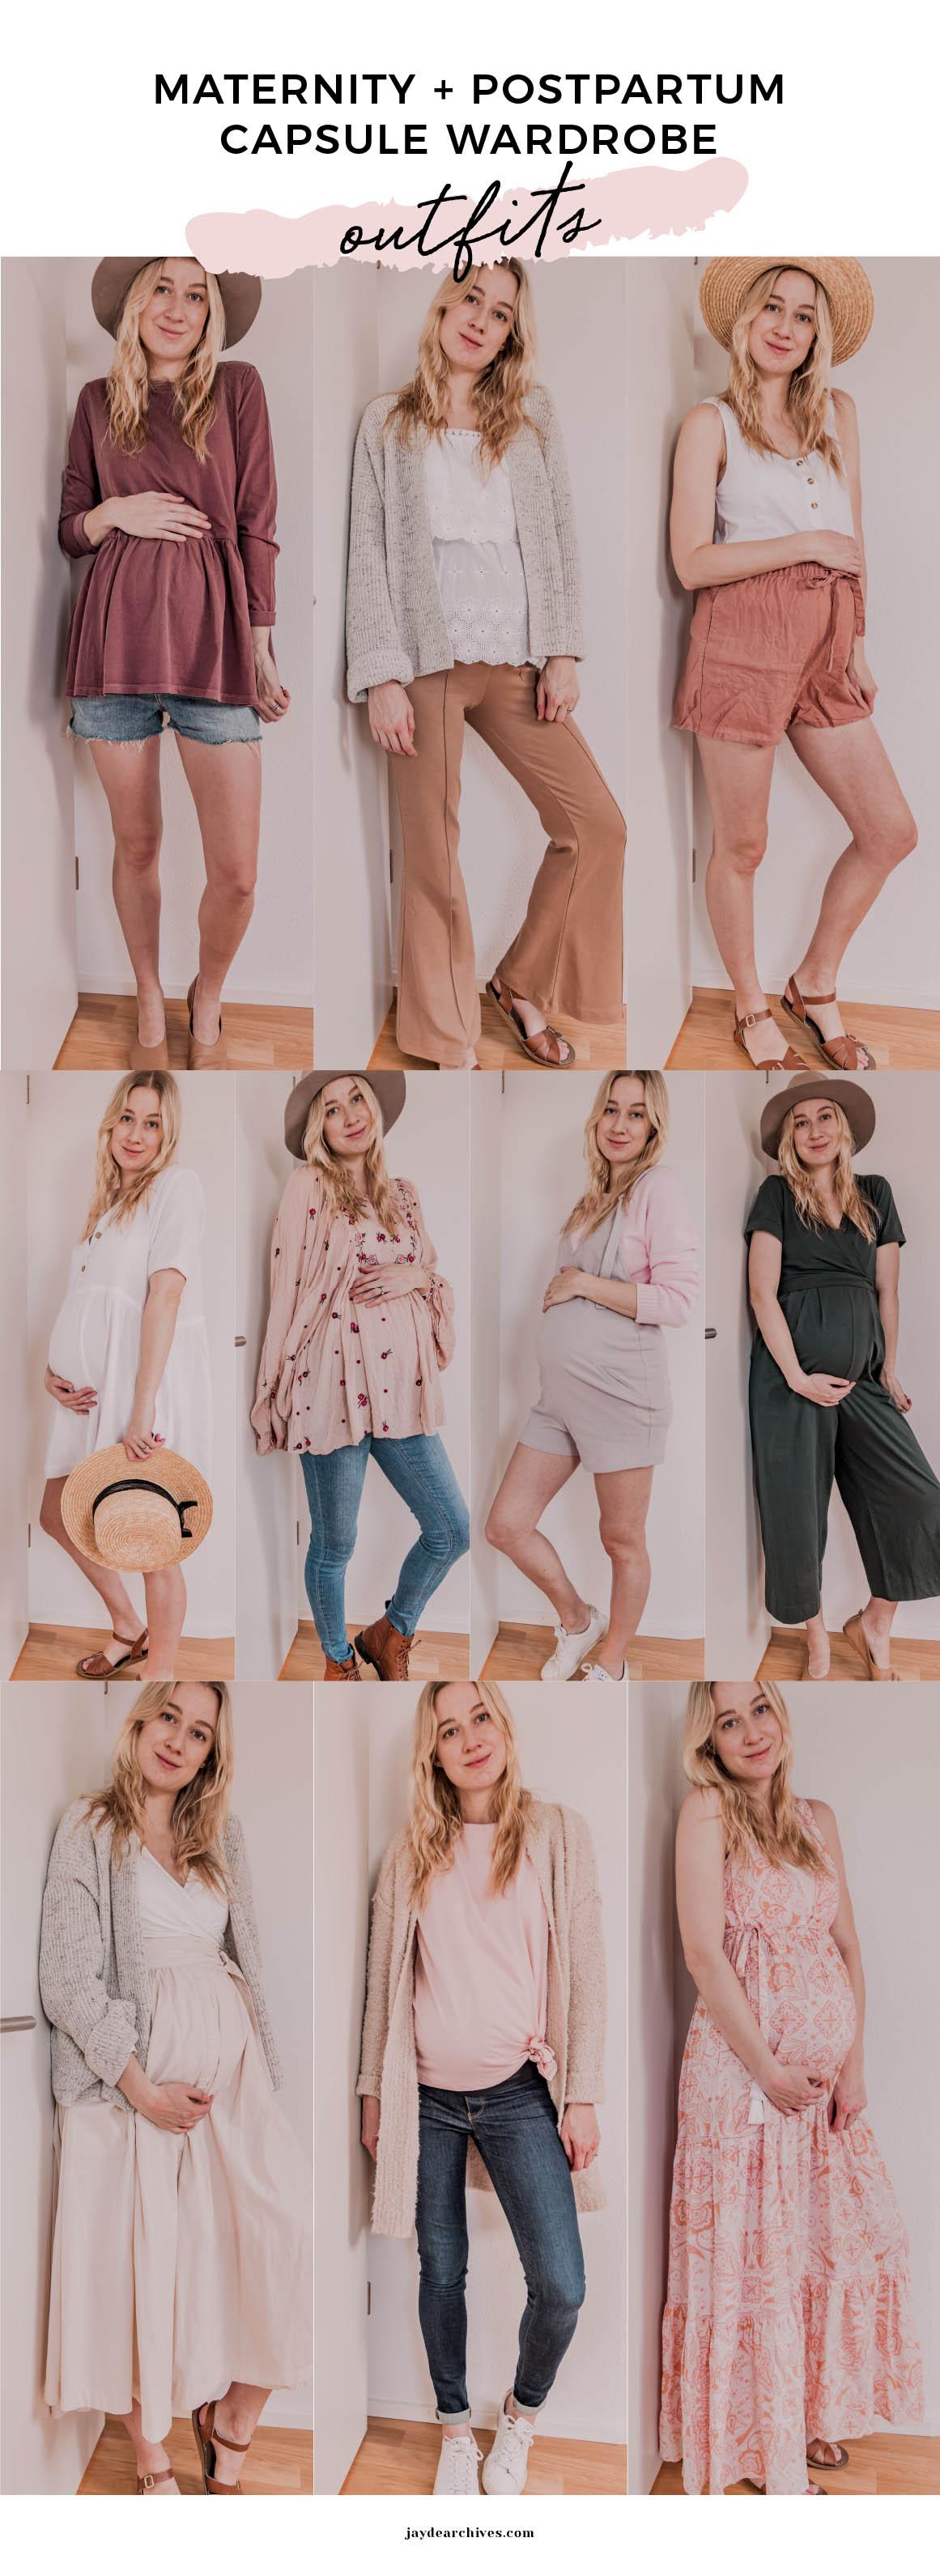 Maternity Postpartum Capsule Wardrobe Outfits